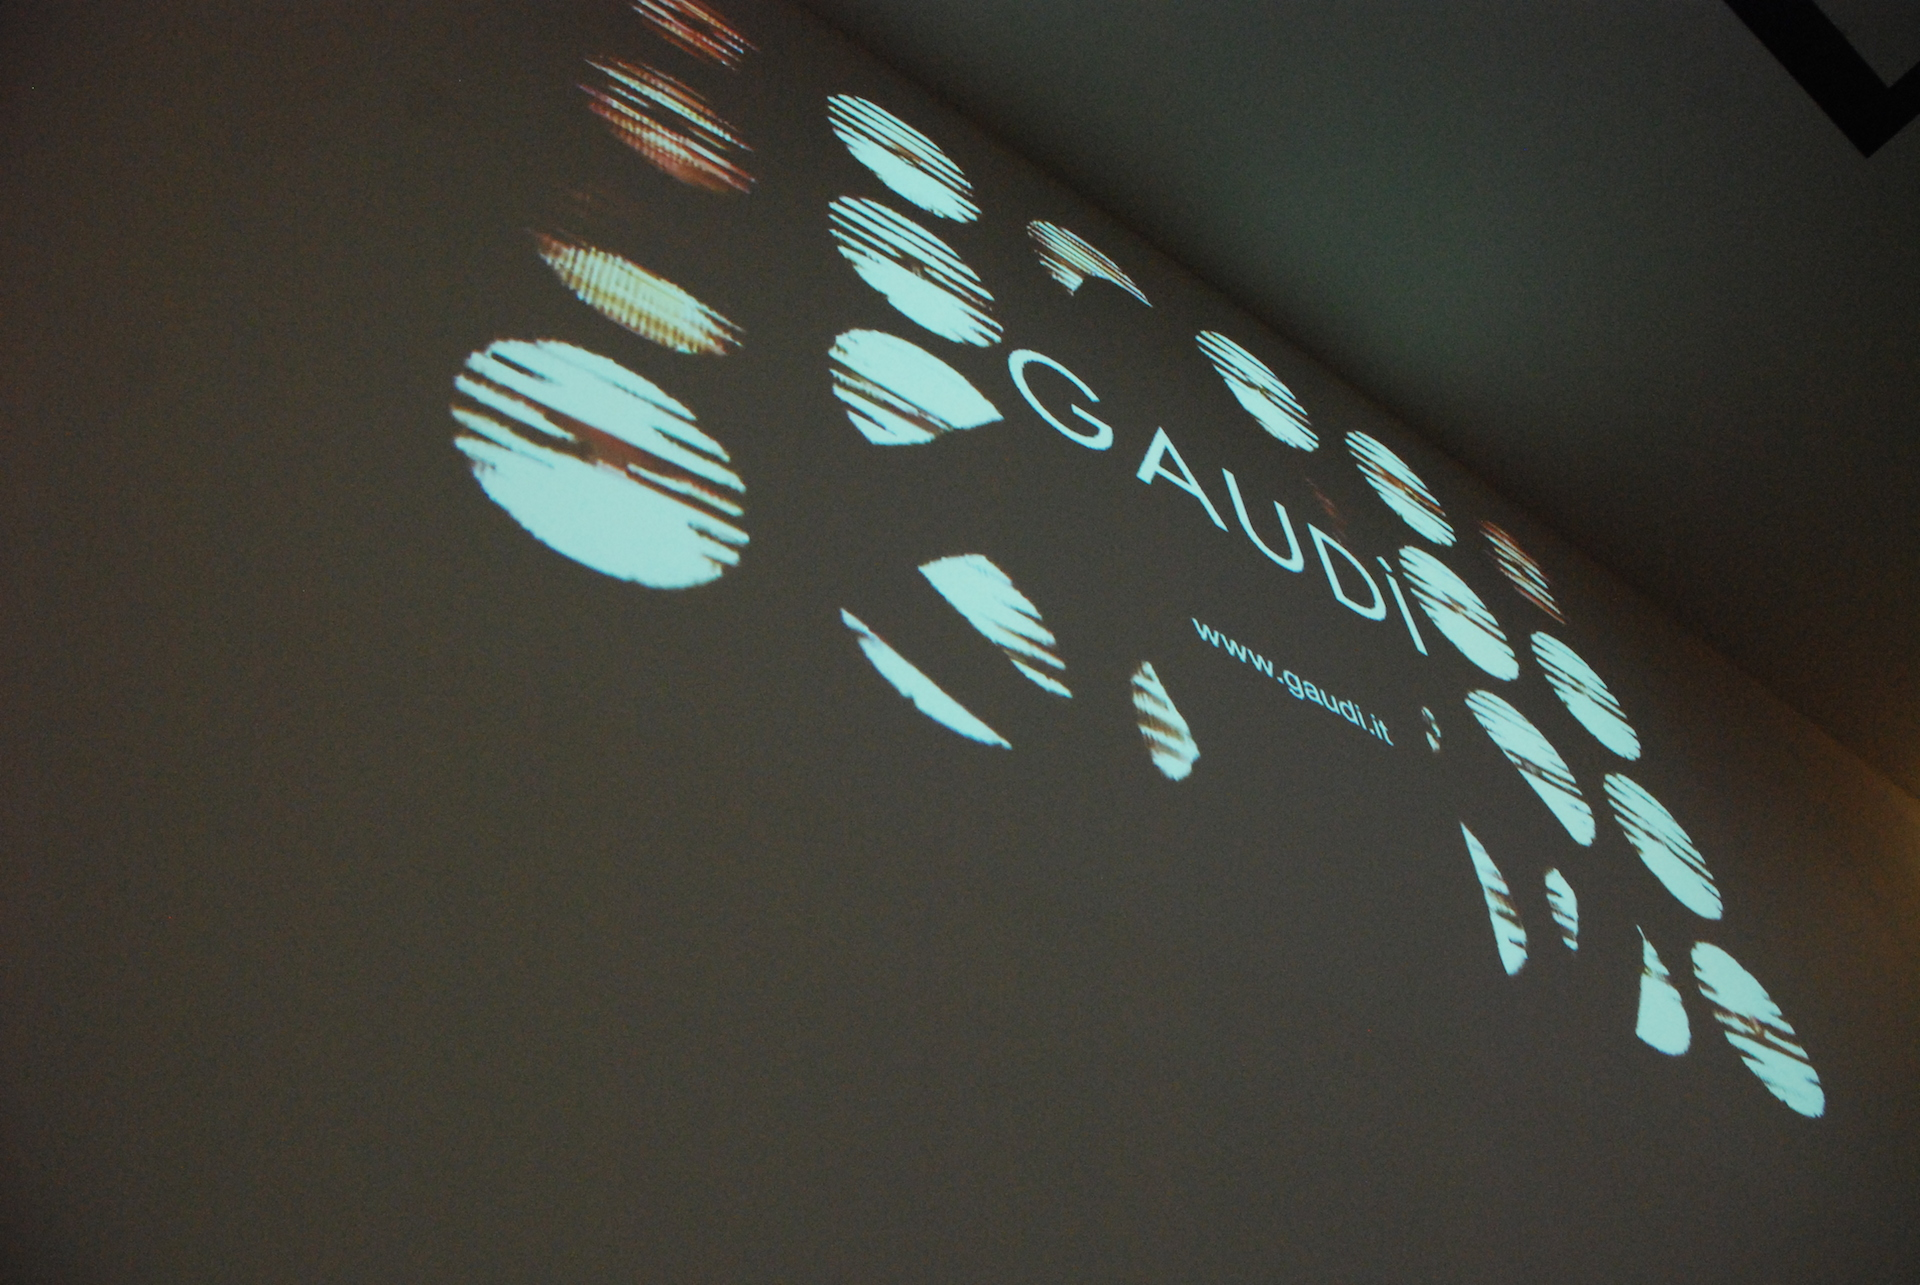 Gaudì Trade Spa - Modena